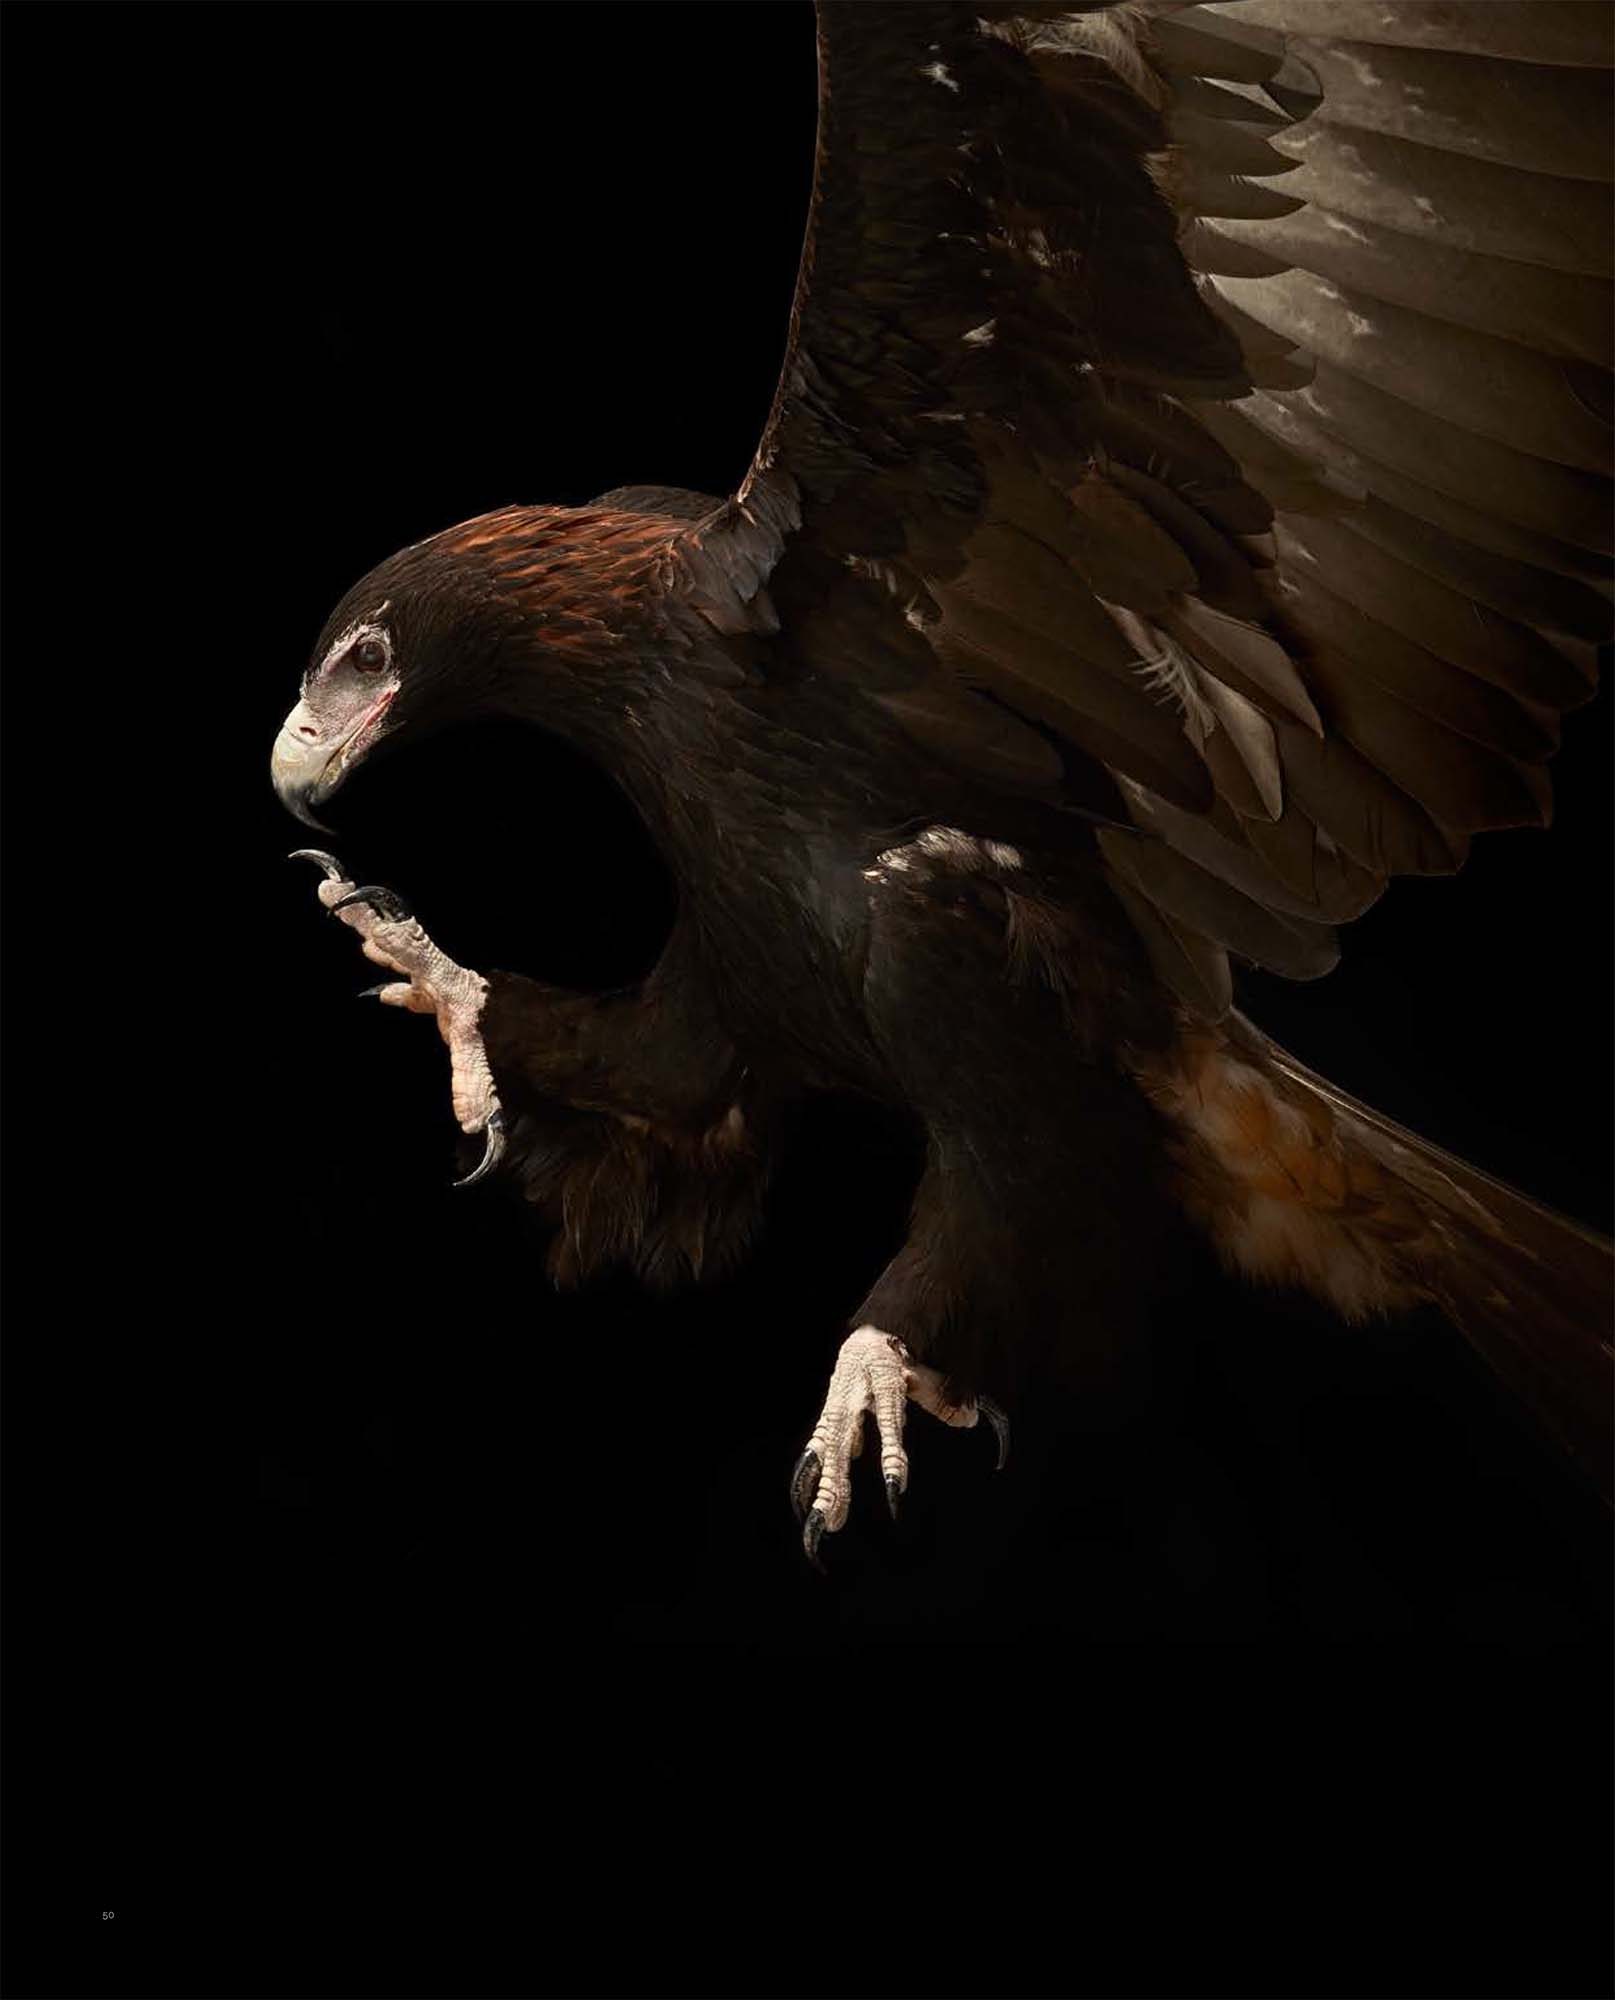 BIRD Gary Heery Book-completemmockup-52.jpg